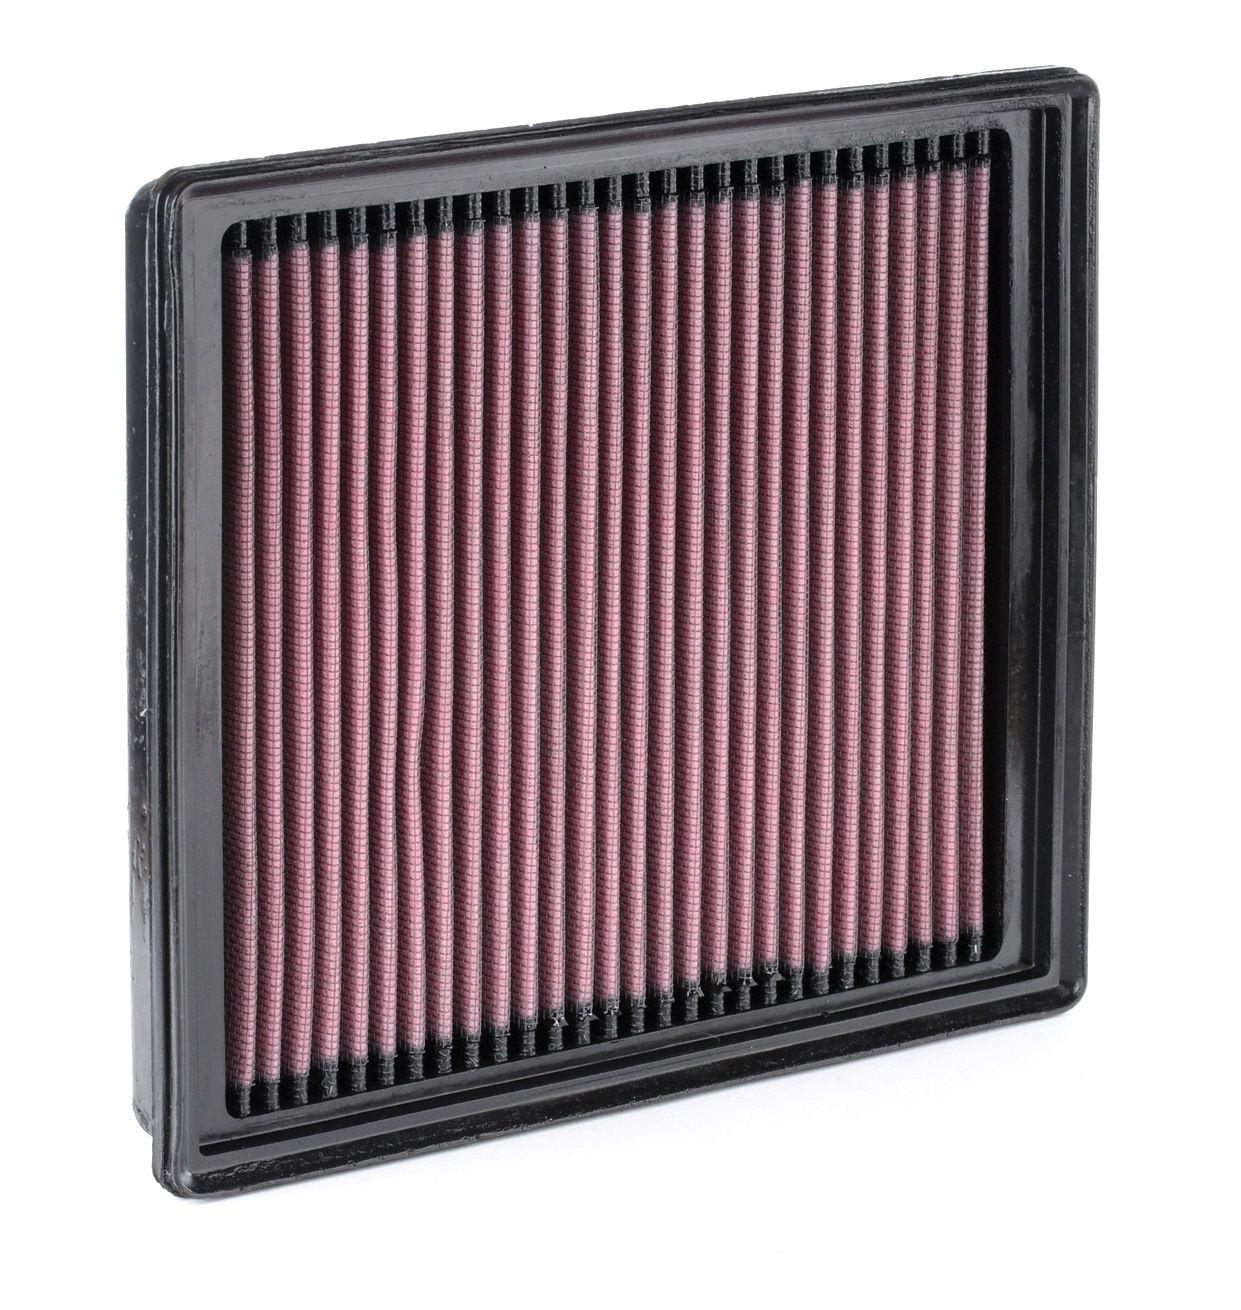 kupite Zracni filter 33-2990 kadarkoli